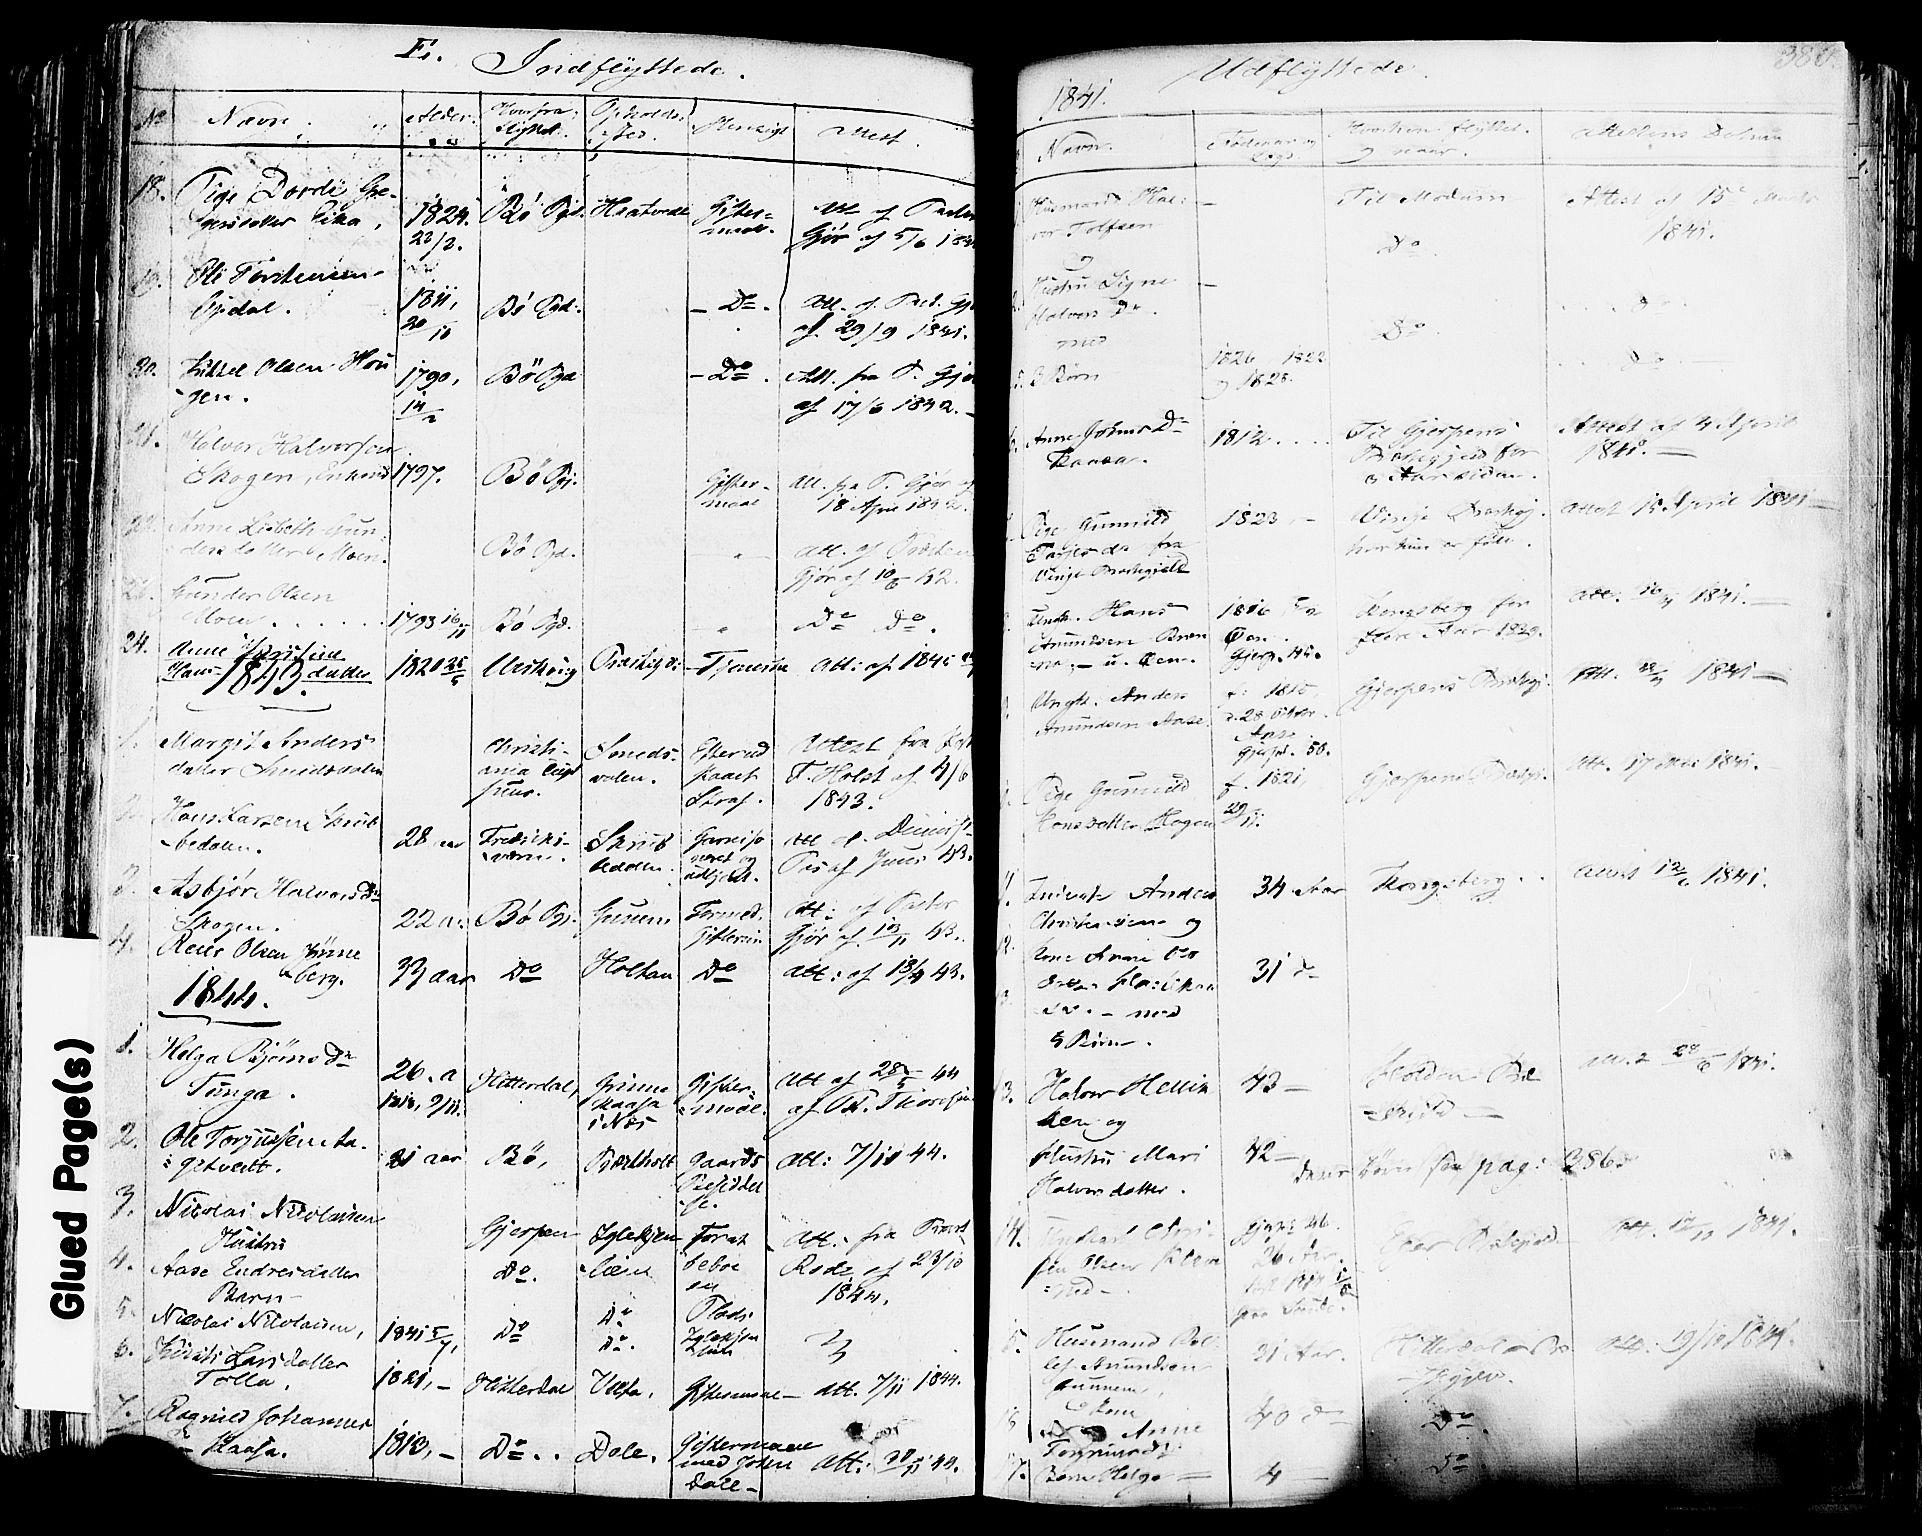 SAKO, Sauherad kirkebøker, F/Fa/L0006: Ministerialbok nr. I 6, 1827-1850, s. 380